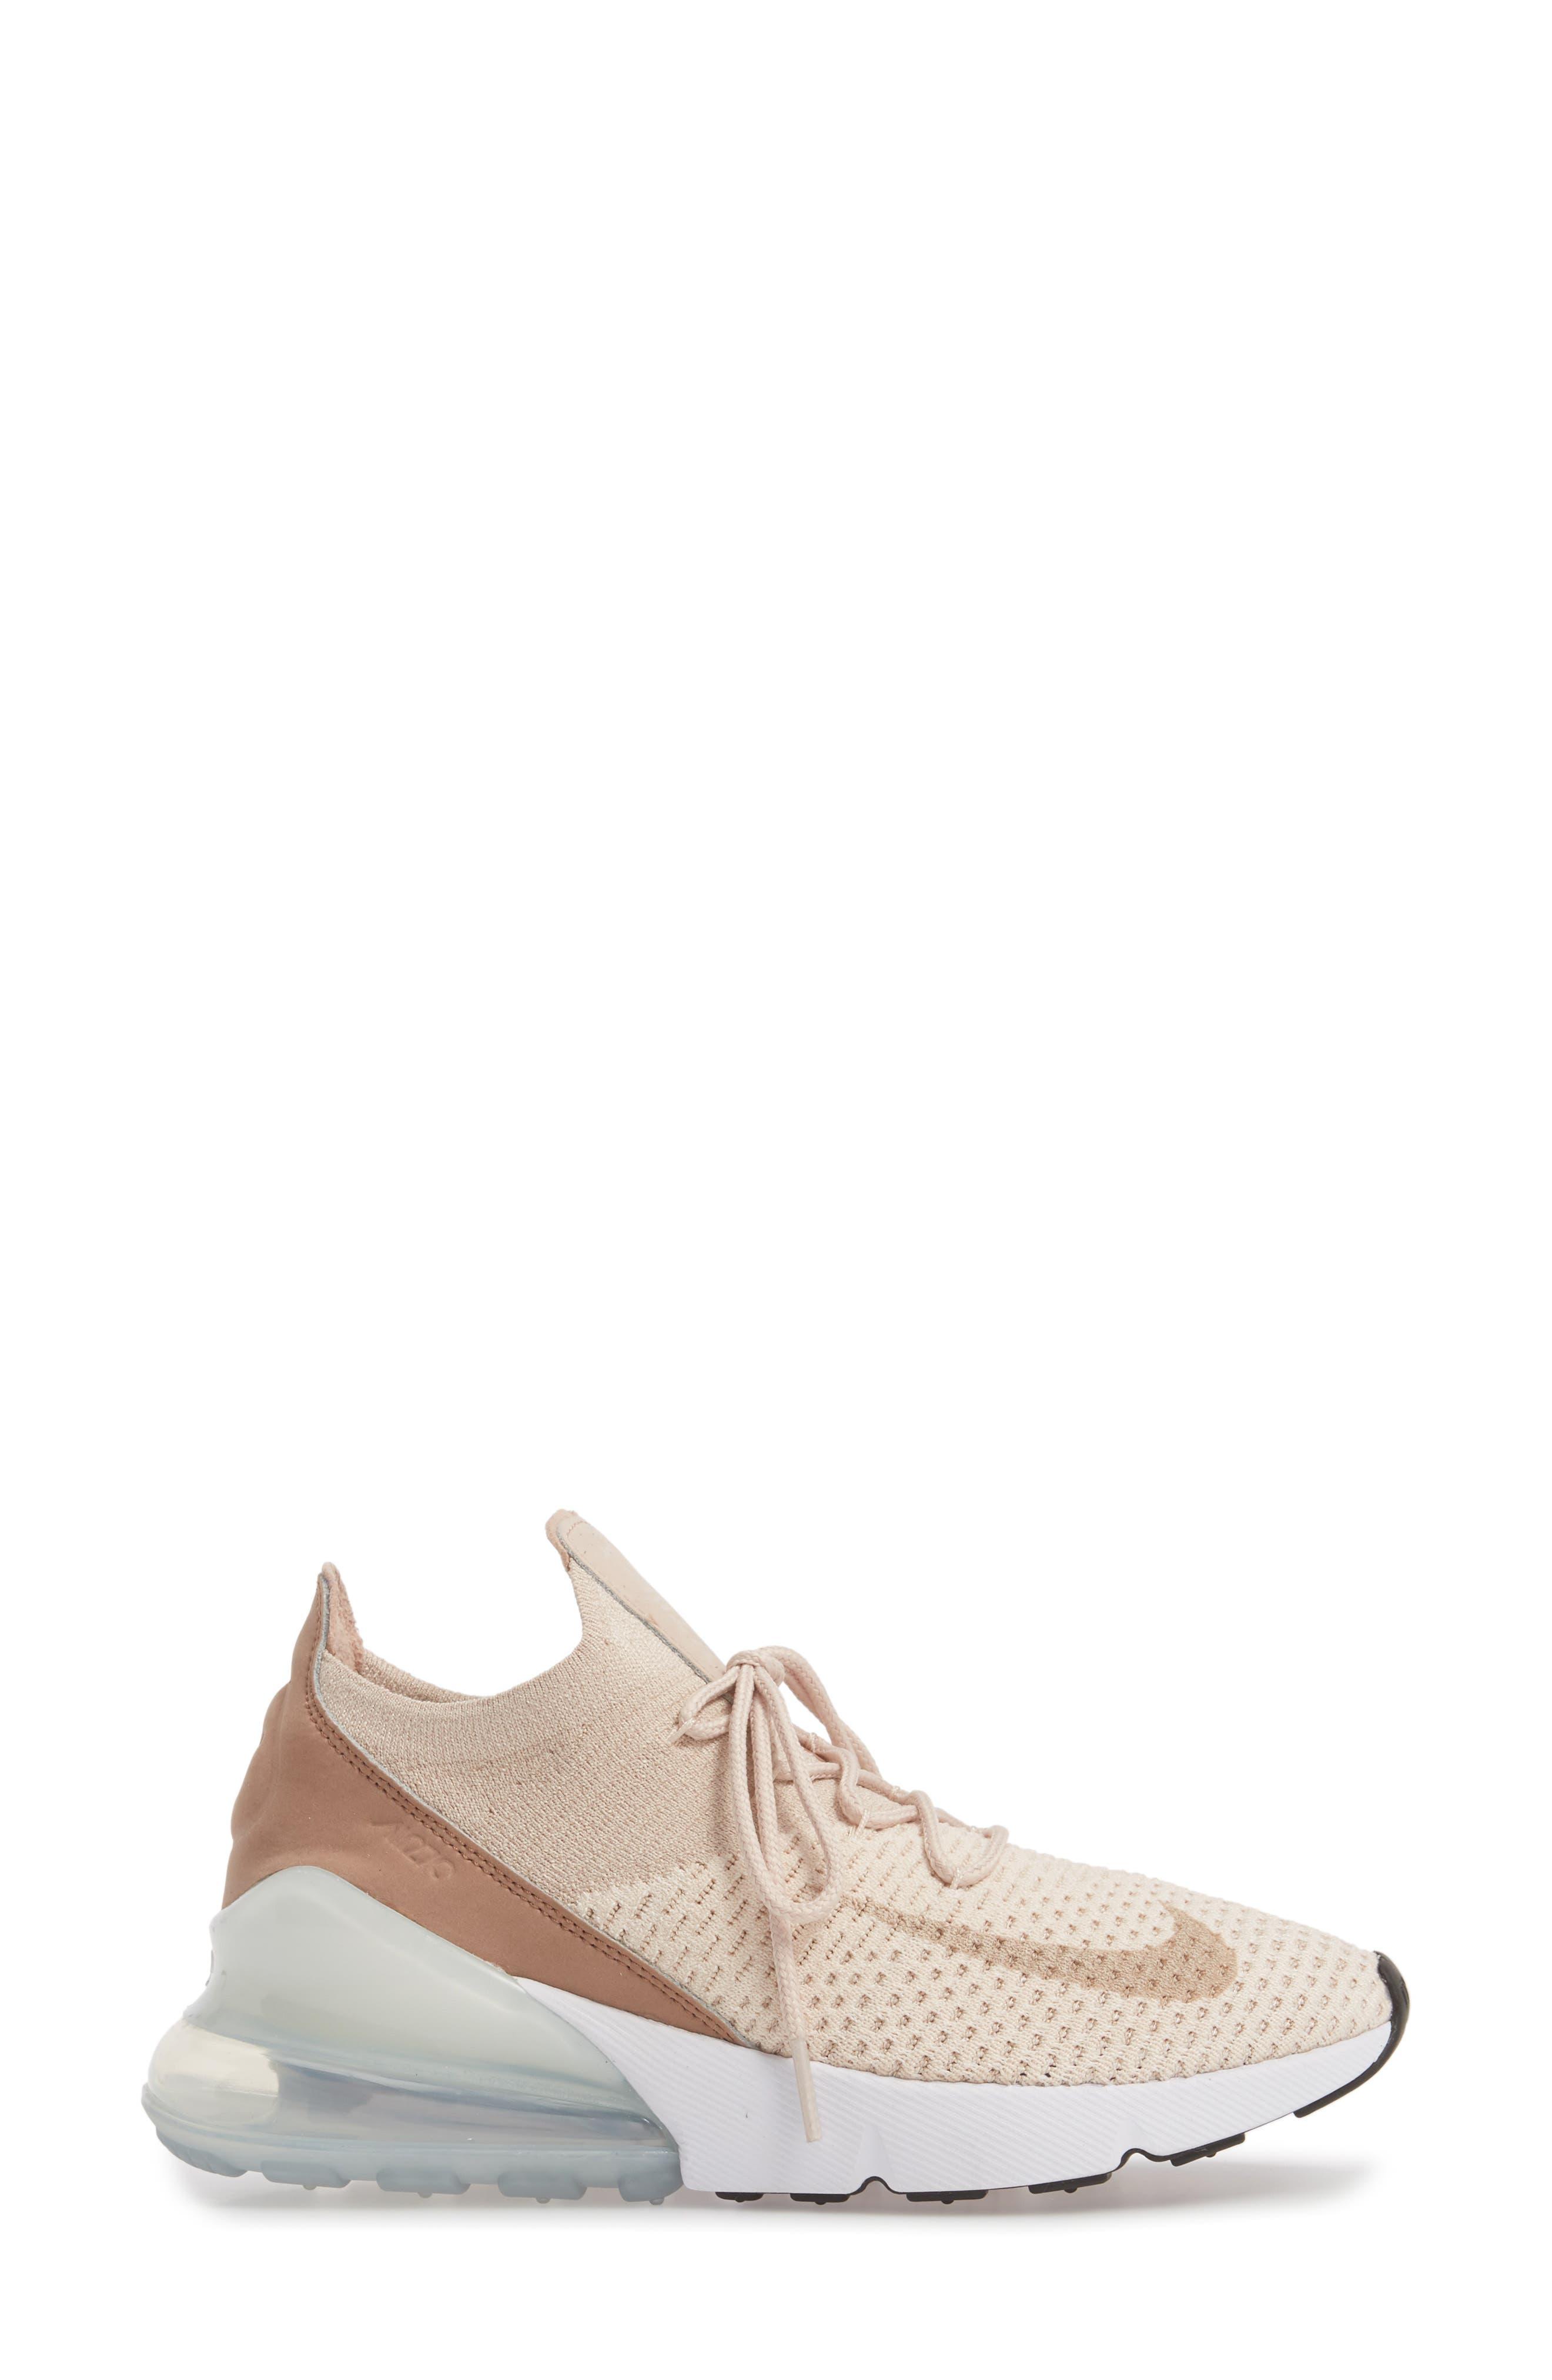 Air Max 270 Flyknit Sneaker,                             Alternate thumbnail 20, color,